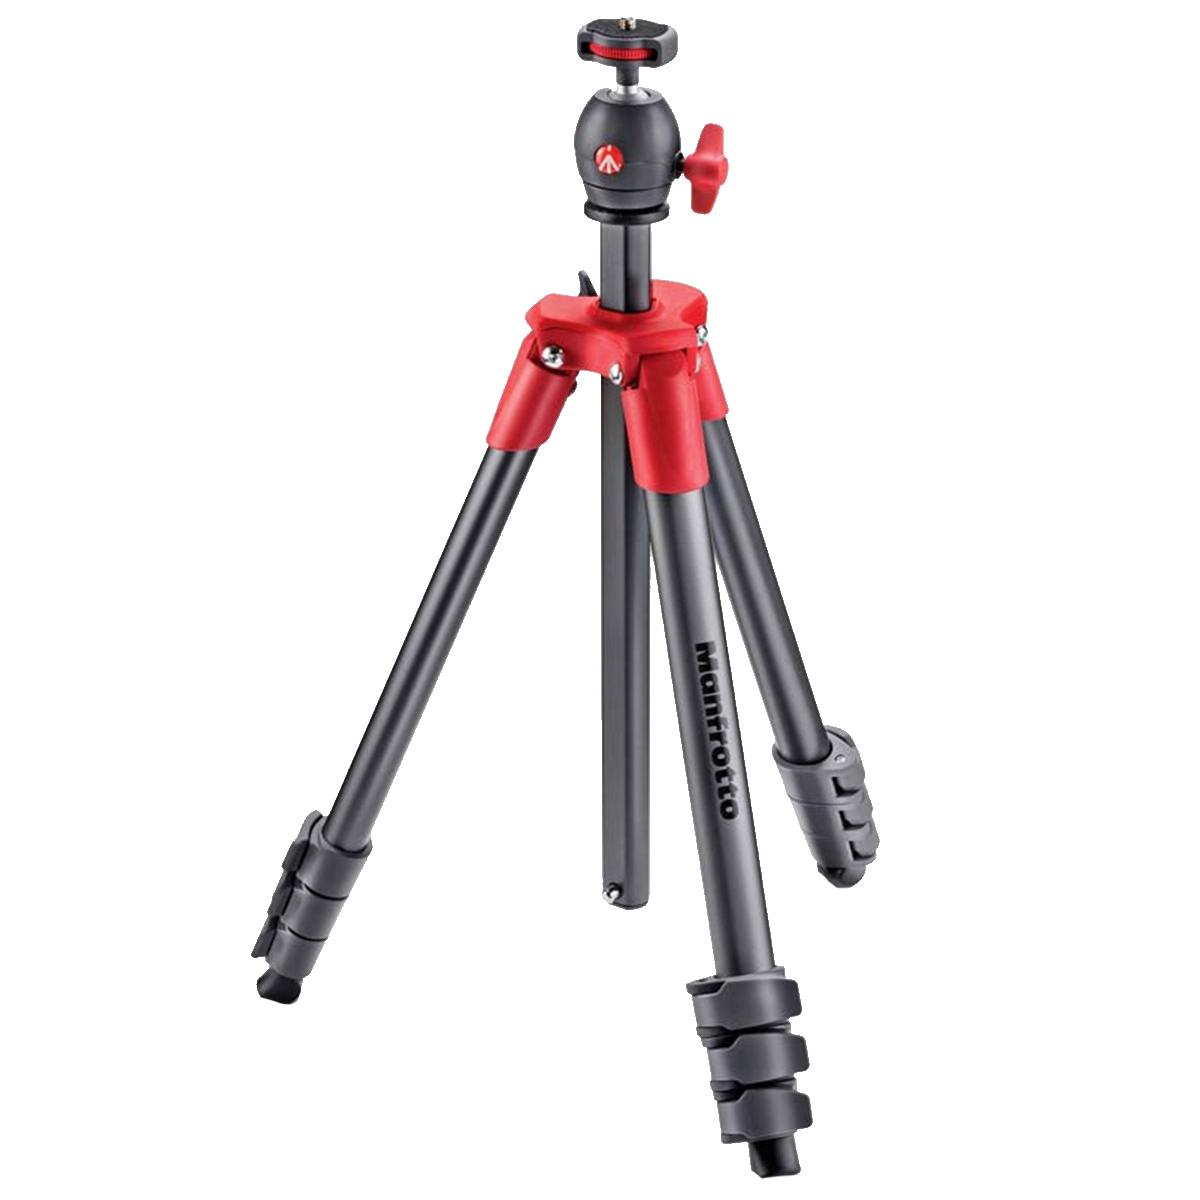 سه پایه دوربین منفروتو مدل MKCOMPACTLT-RD